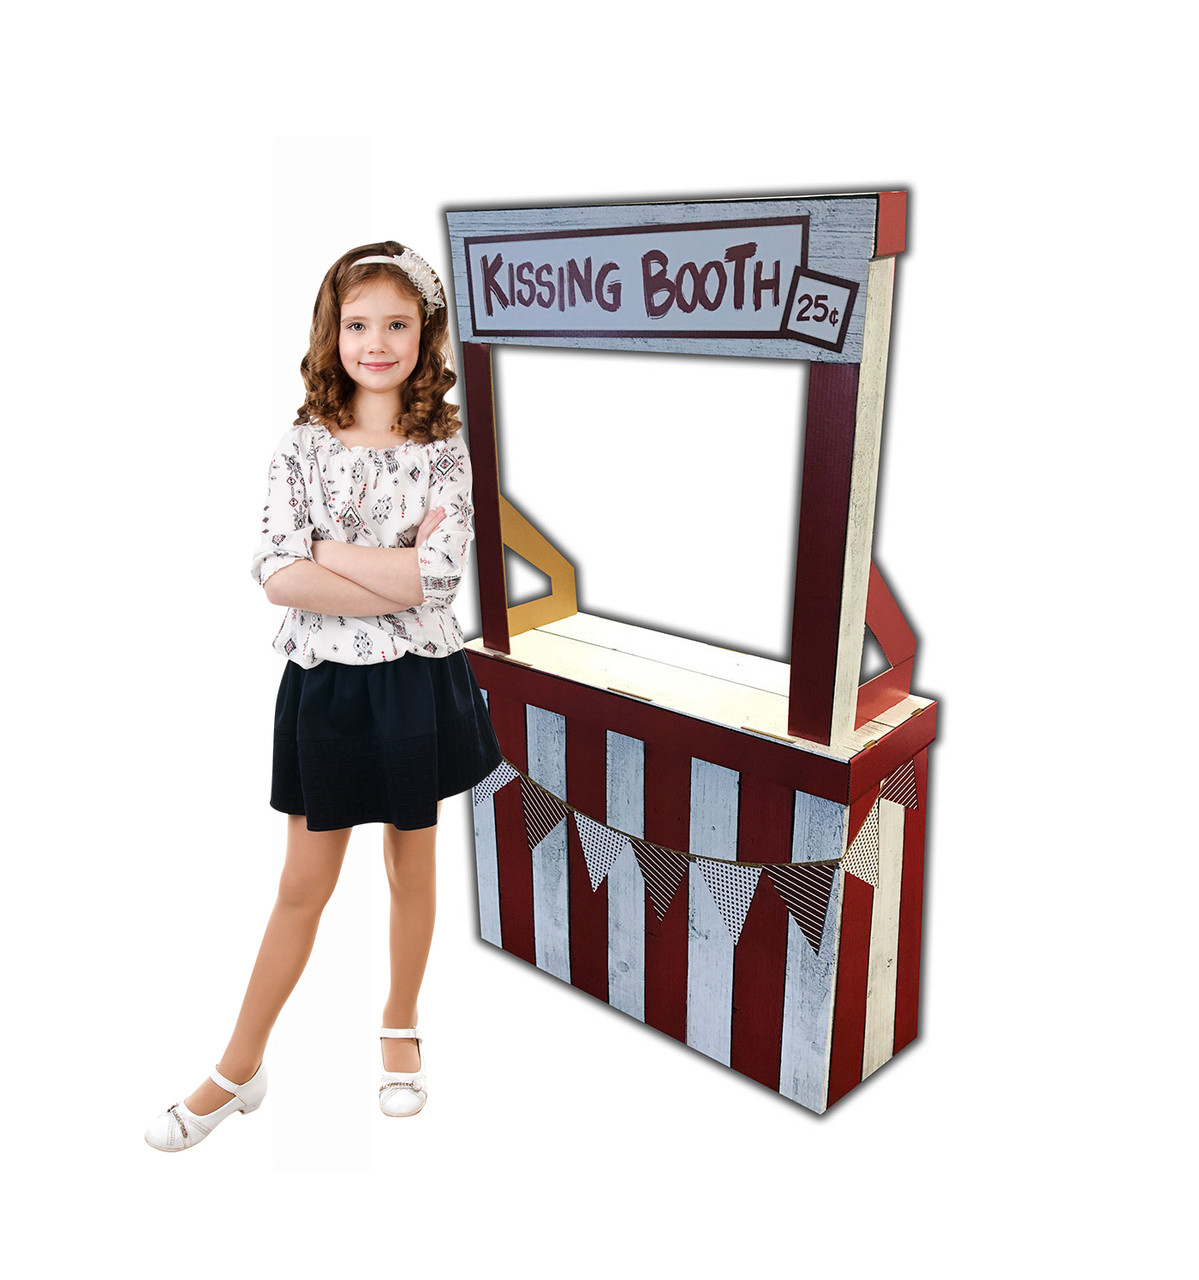 Life-size Kissing Booth Cardboard Standup | Cardboard Cutout 2